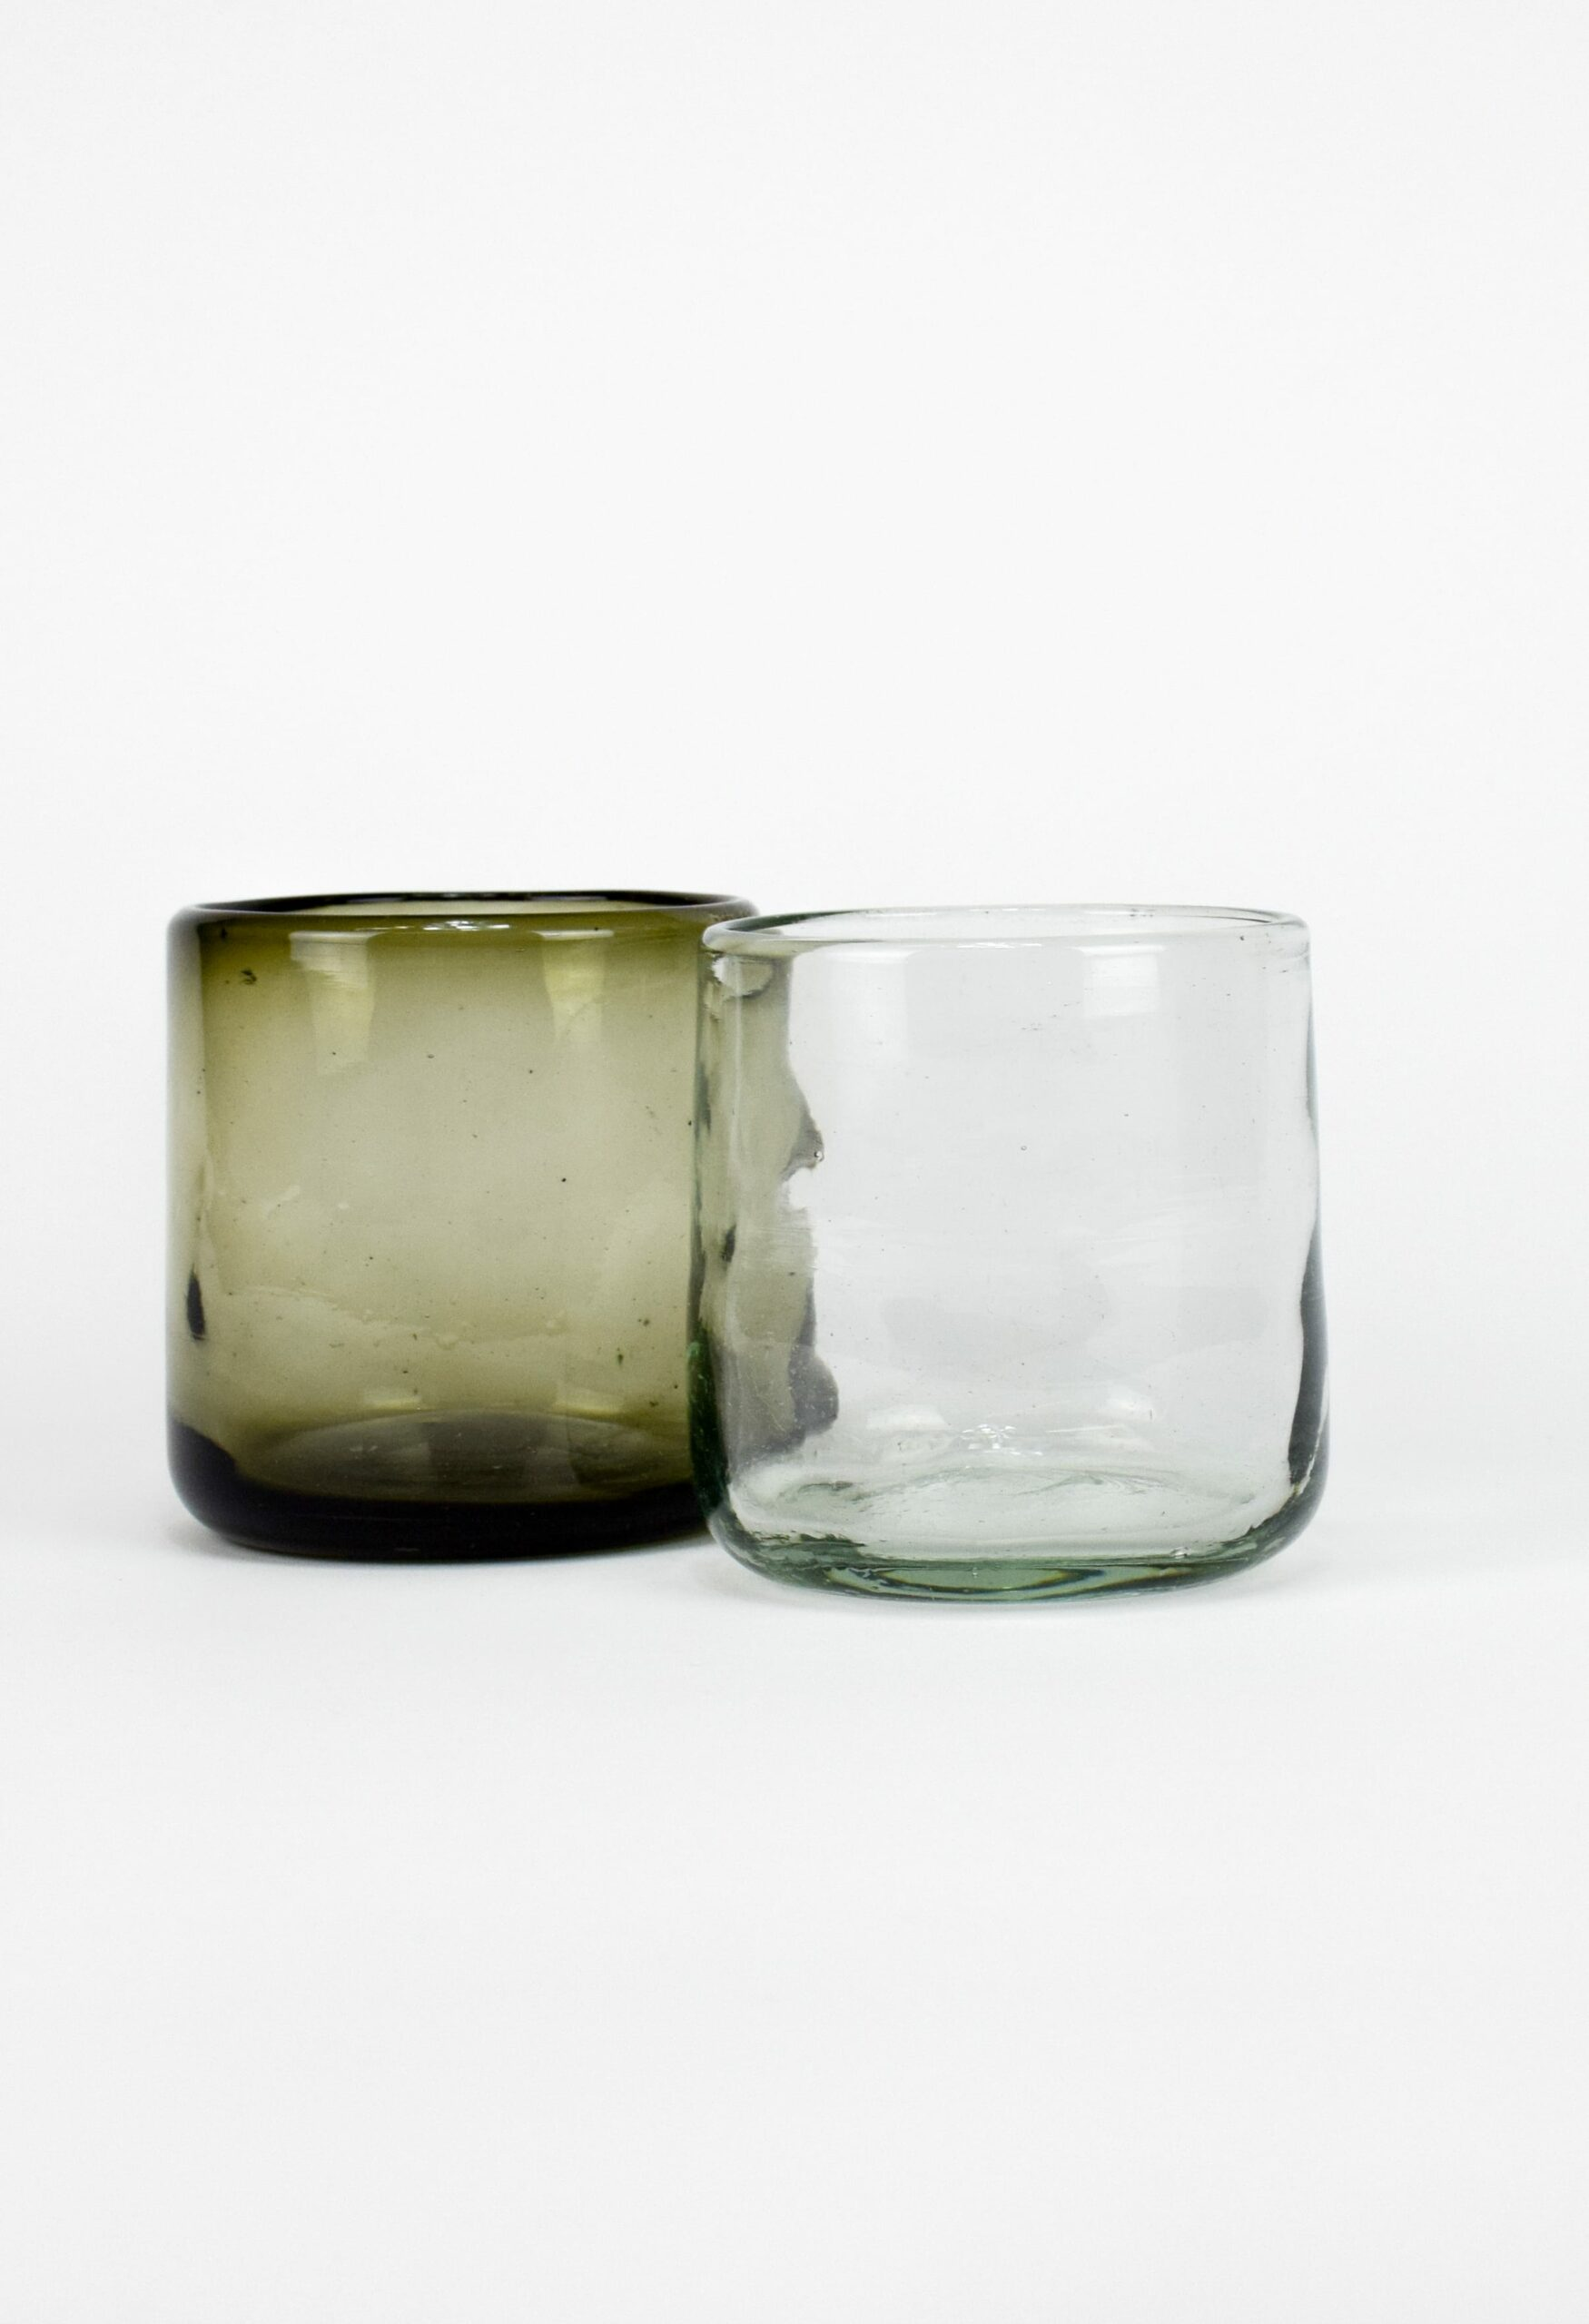 La Muerte Tiene Permiso - White Lights - Handmade Recycled Glass Tumbler